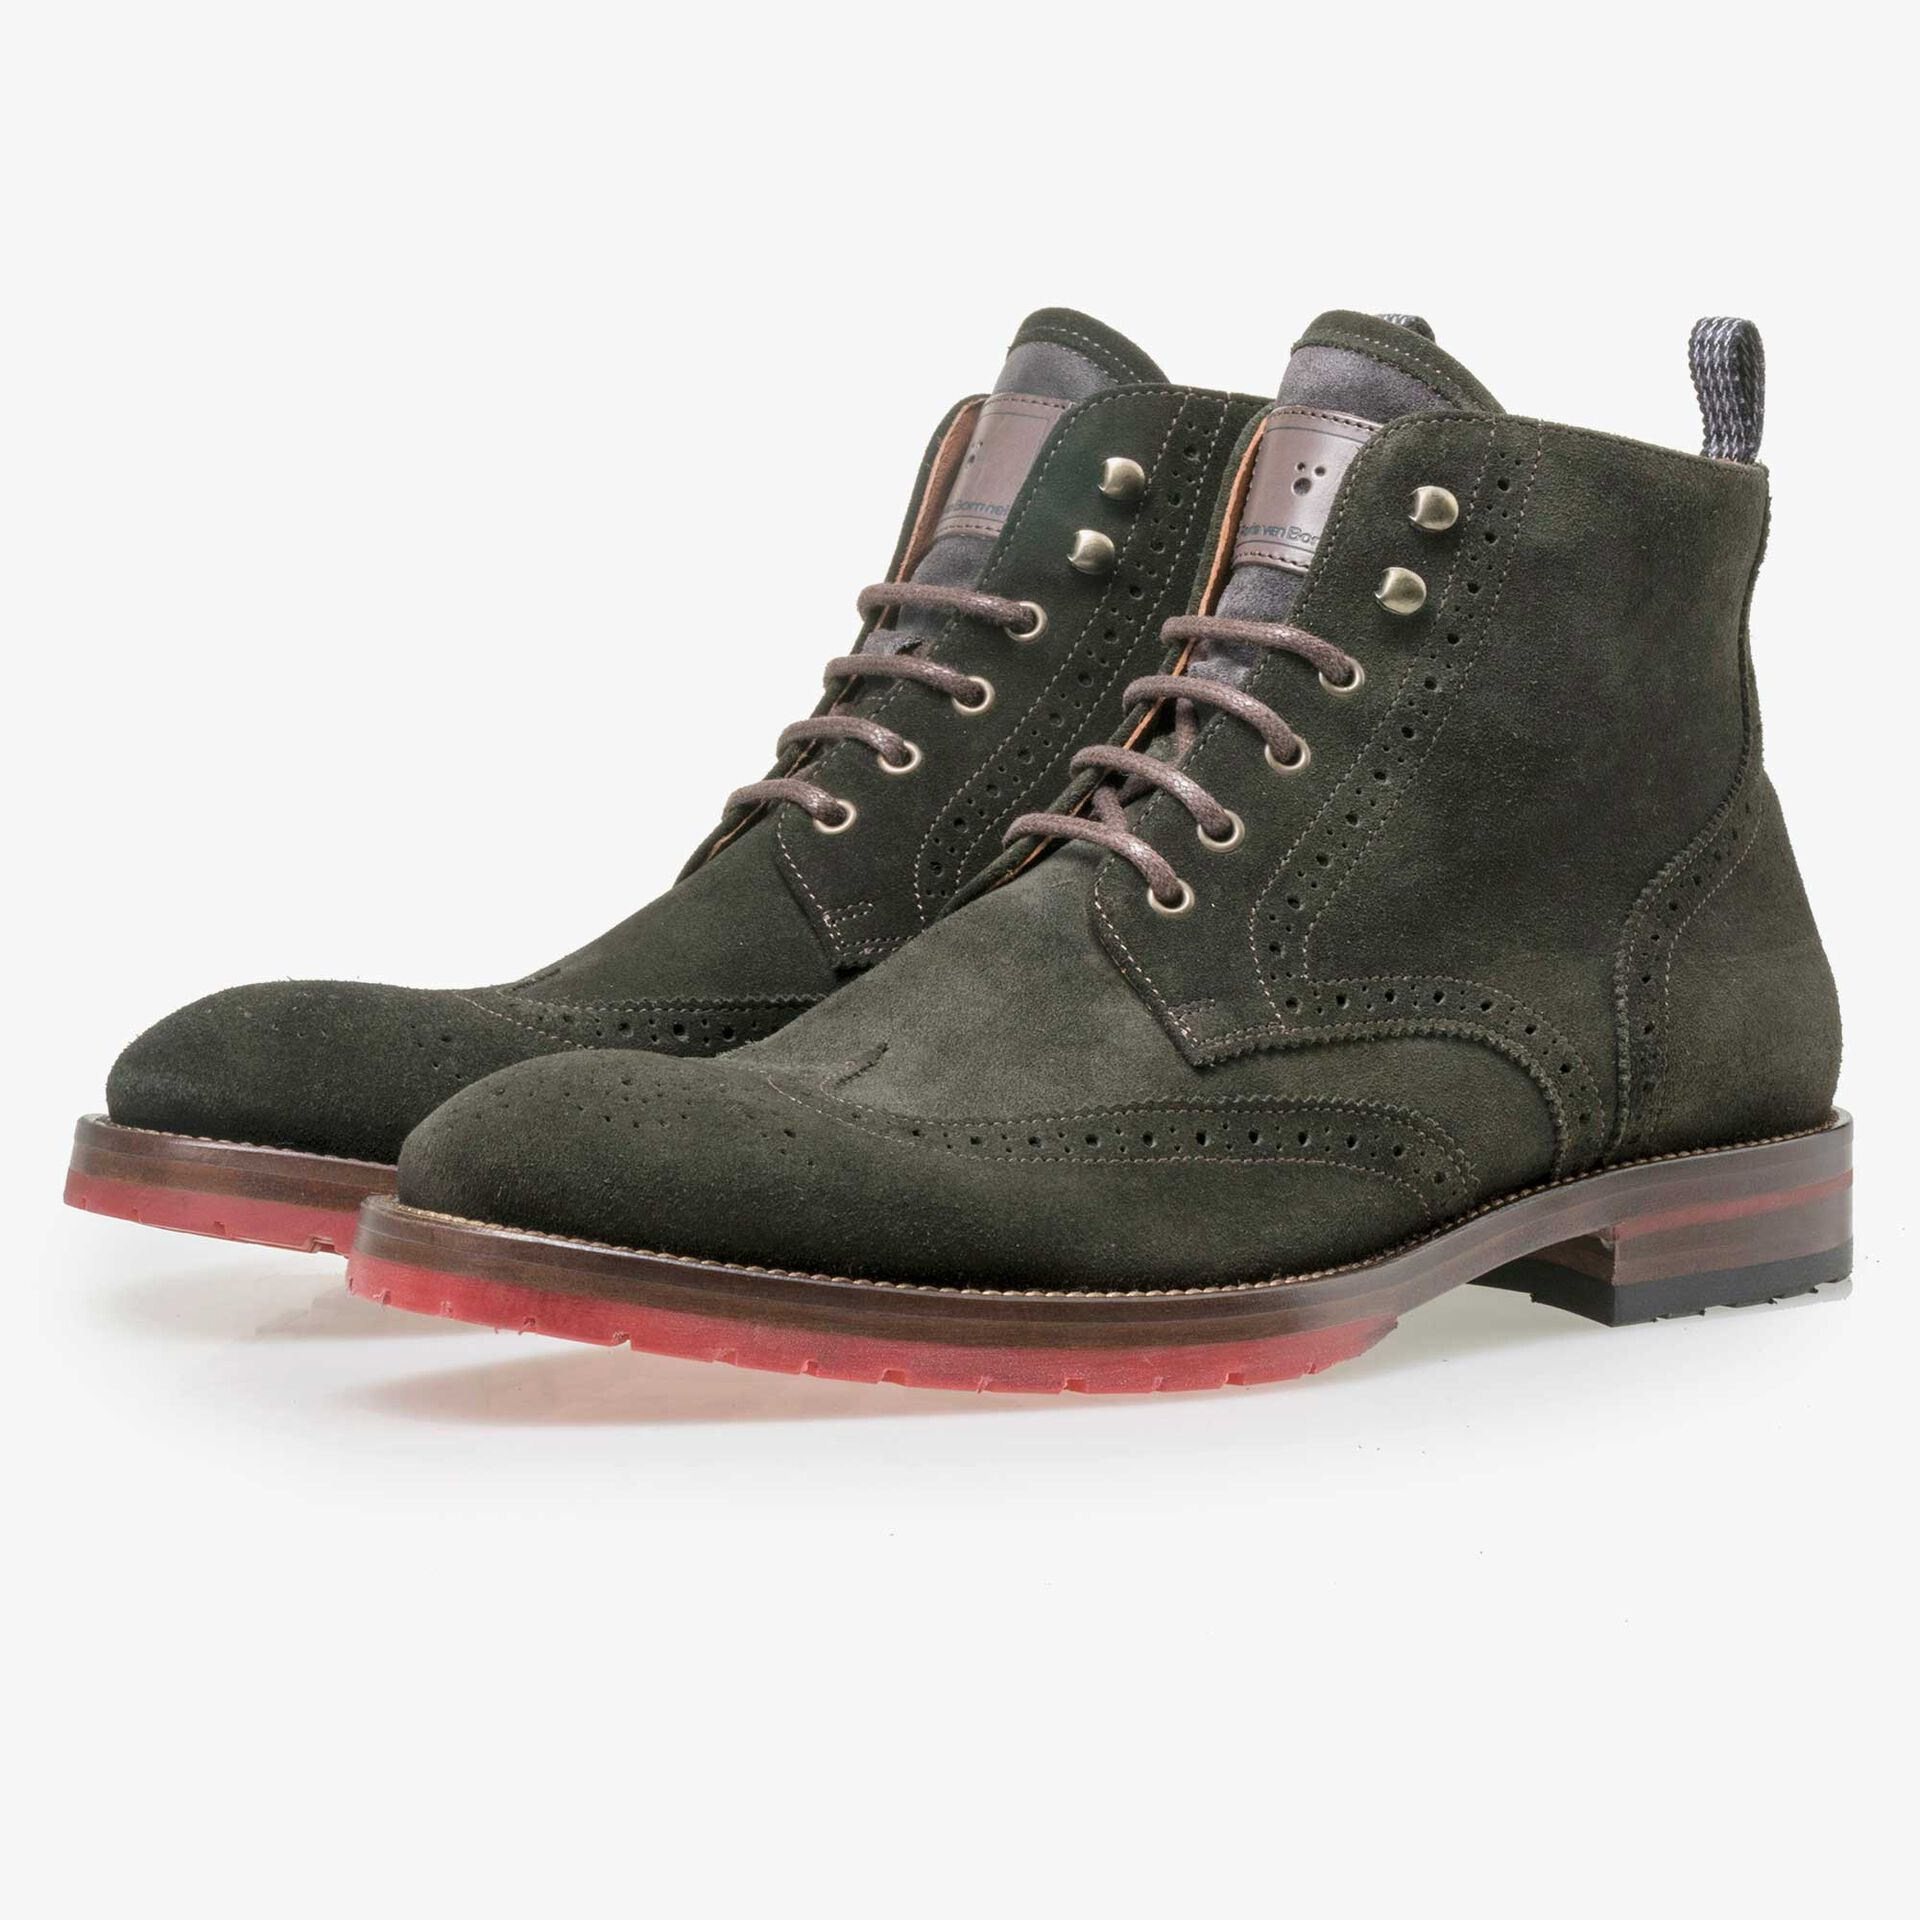 Floris van Bommel men's olive green suede leather brogue lace boot